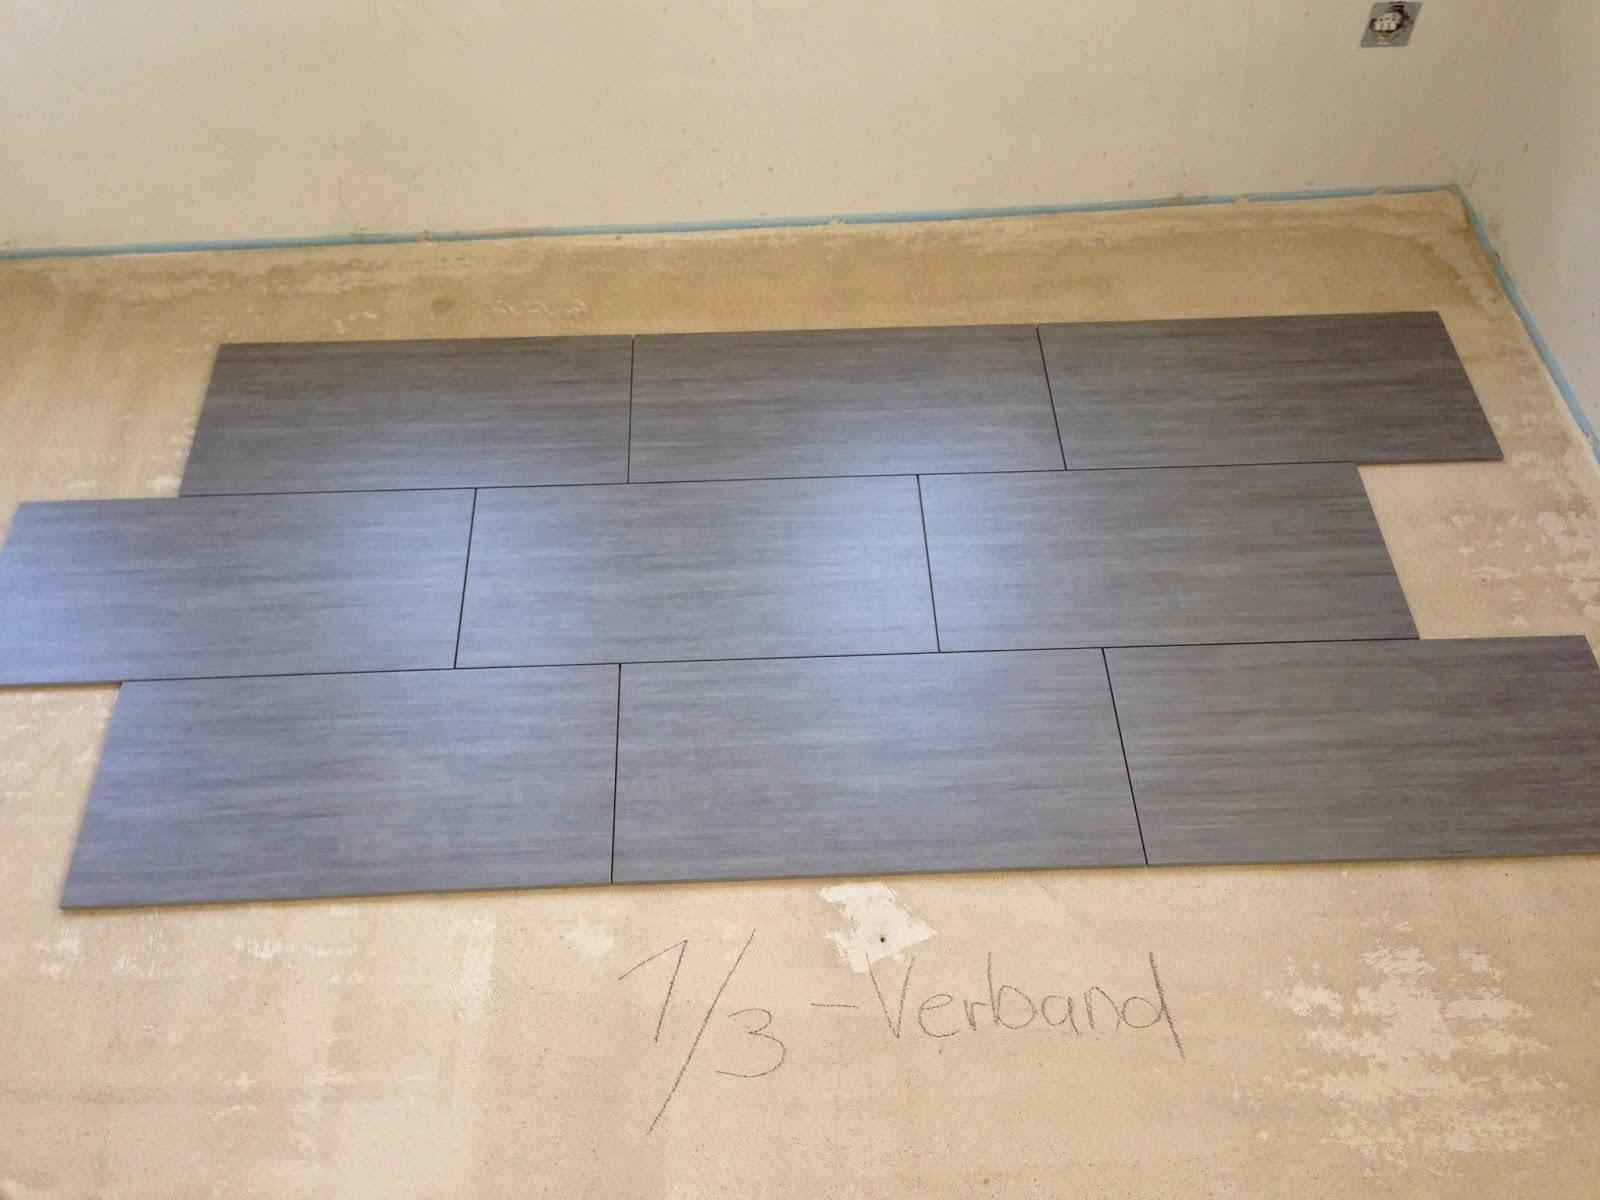 projekt f4 fliesenverlegemuster. Black Bedroom Furniture Sets. Home Design Ideas